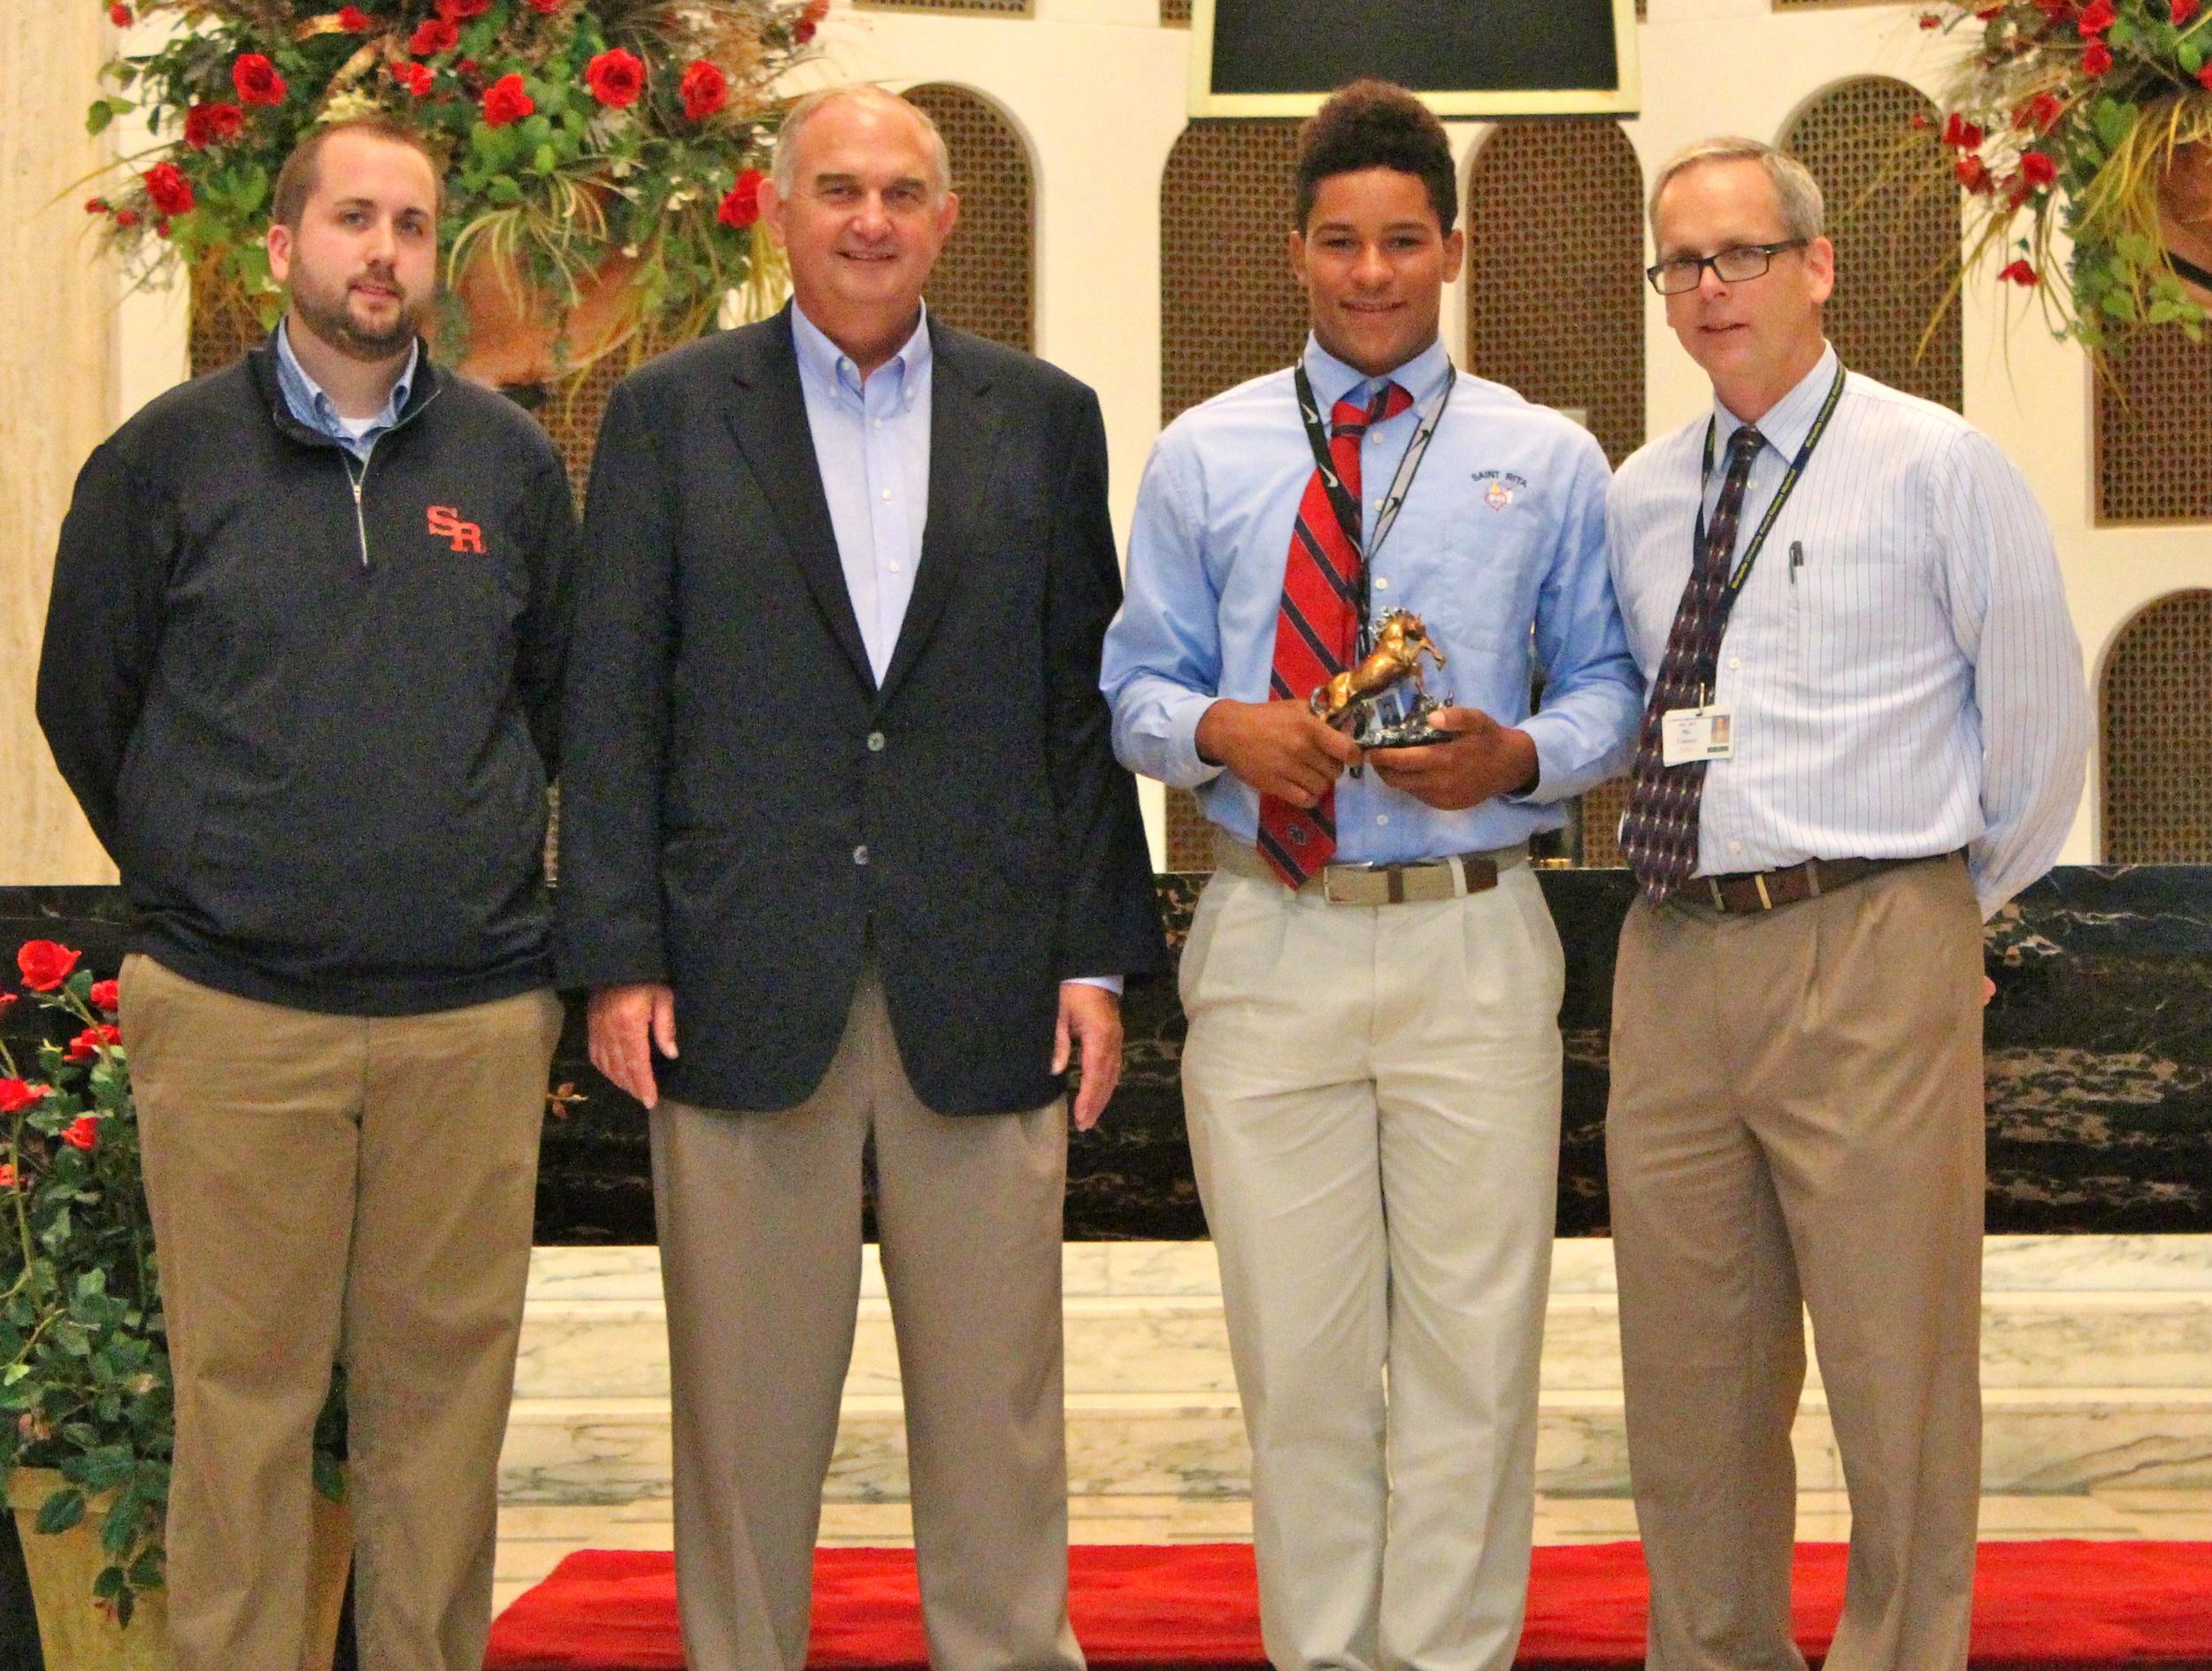 L to R: Josh Blaszak '04,Director of Student Life & Ministry; Ernie Mrozek '71, President;  Christopher Childers,Sophomore Mustang of the Month; Brendan Conroy, Principal